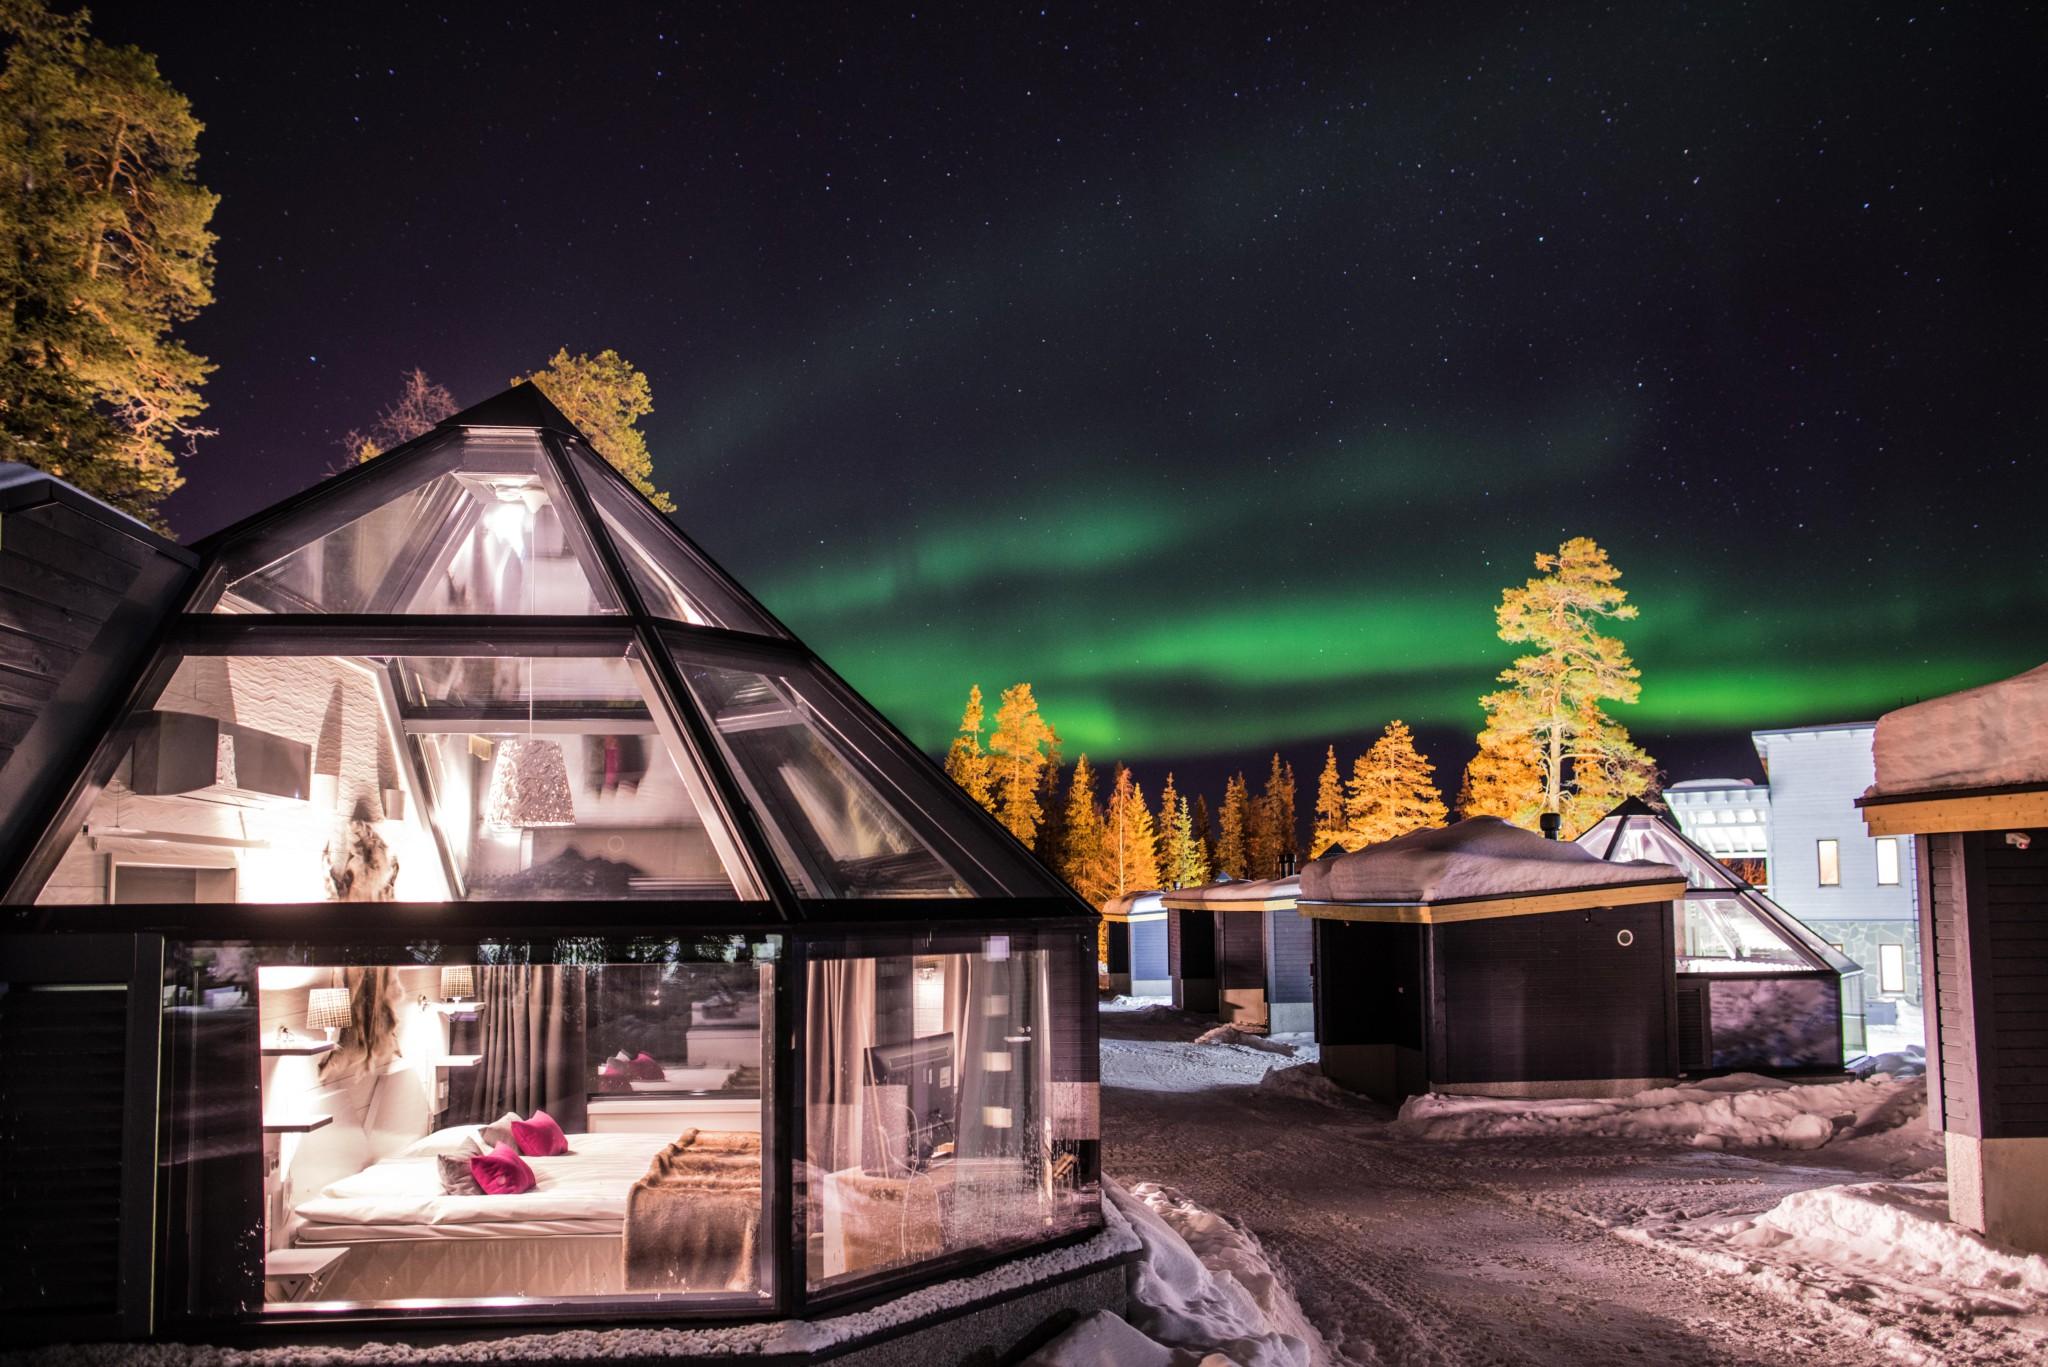 santa s igloos arctic circle in santa claus village rovaniemi lapland. Black Bedroom Furniture Sets. Home Design Ideas